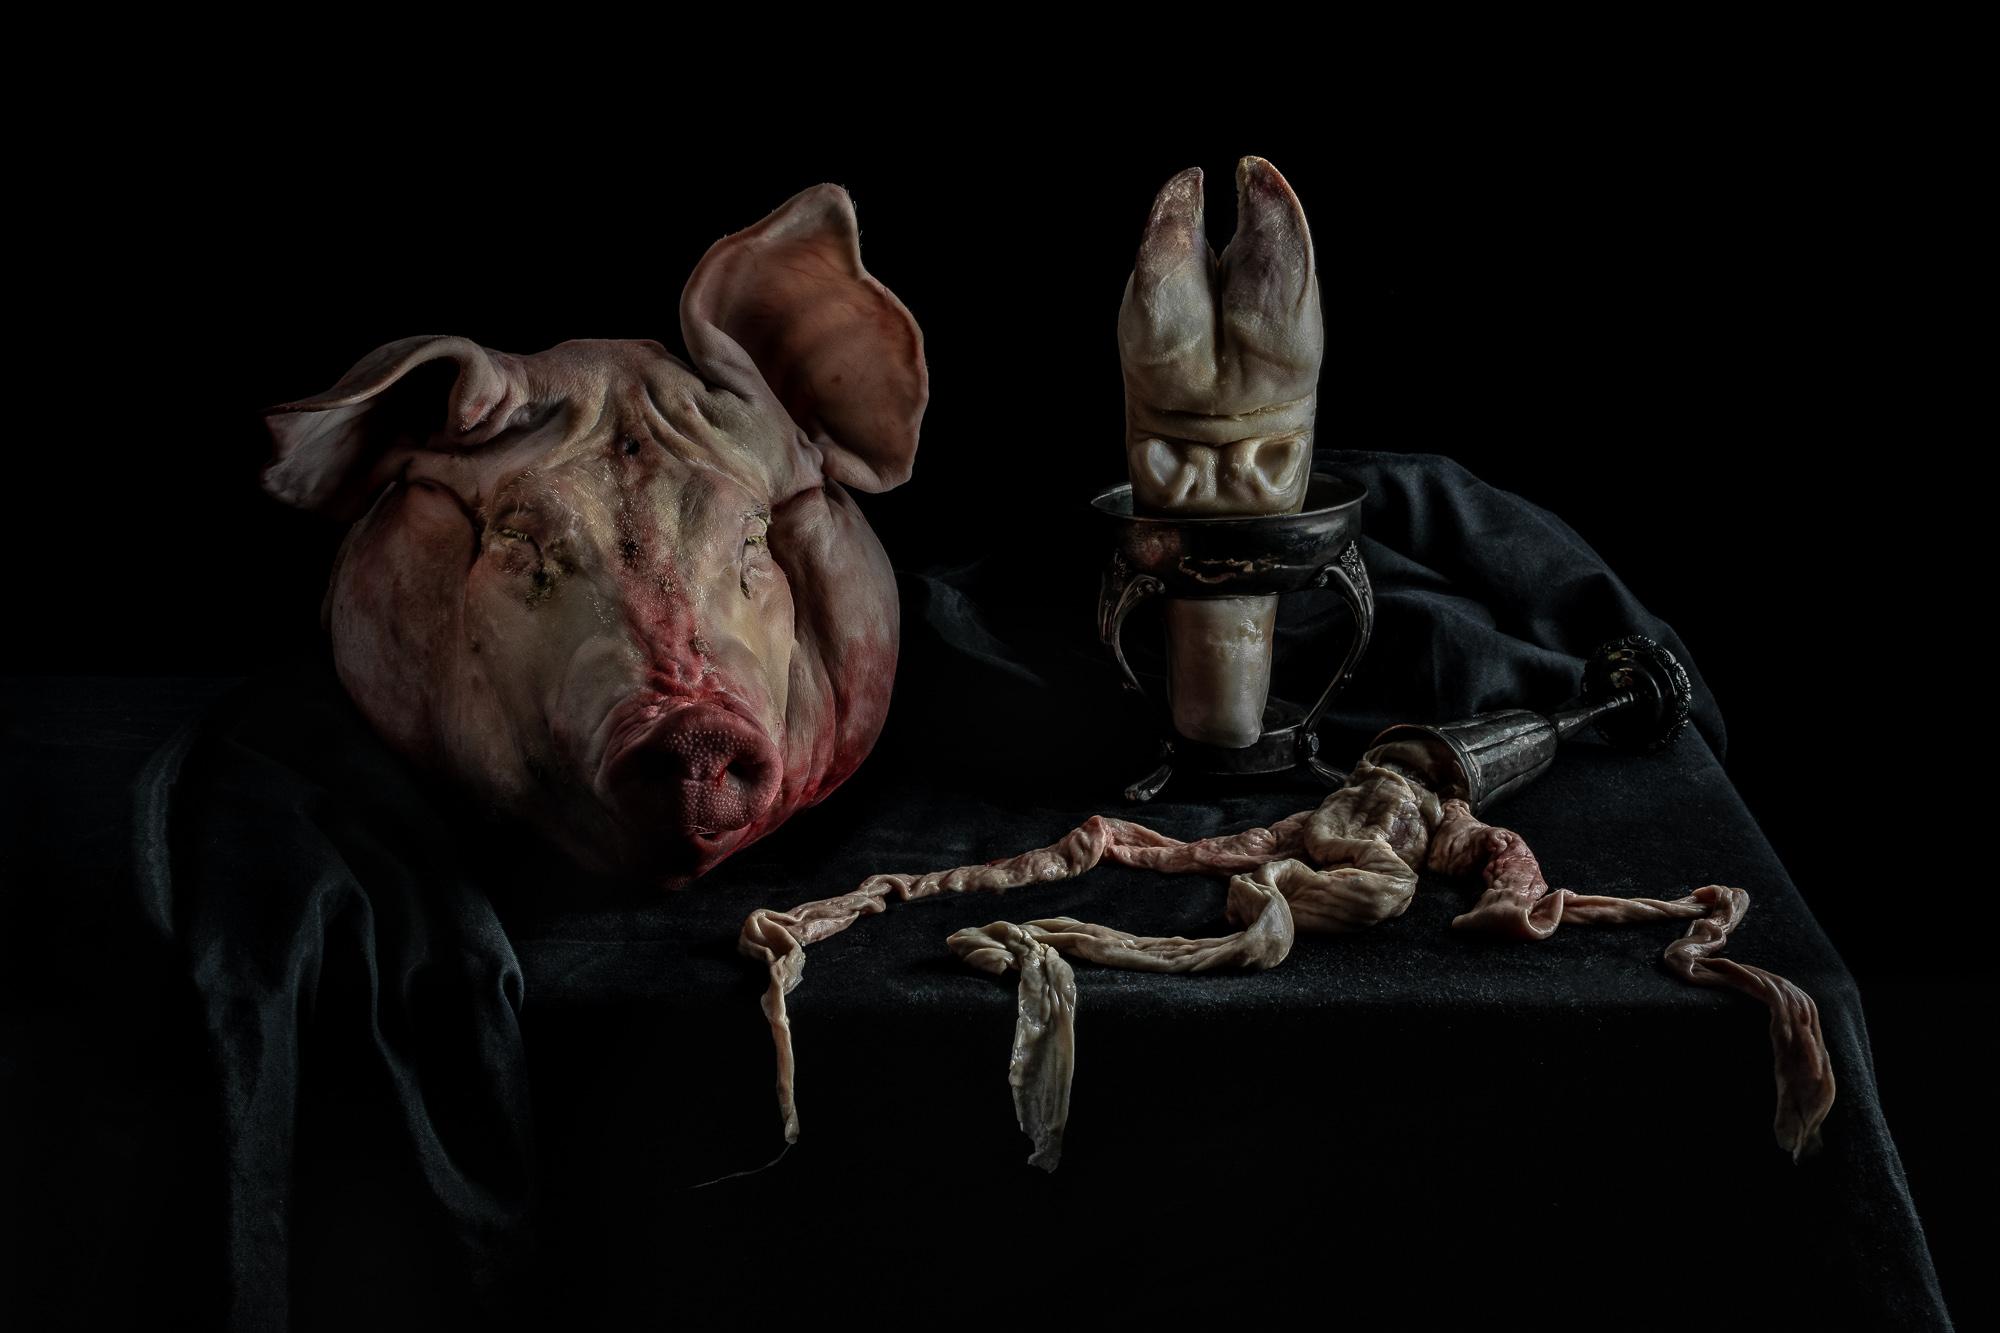 neal-auch-still-life-with-pig-head.jpg